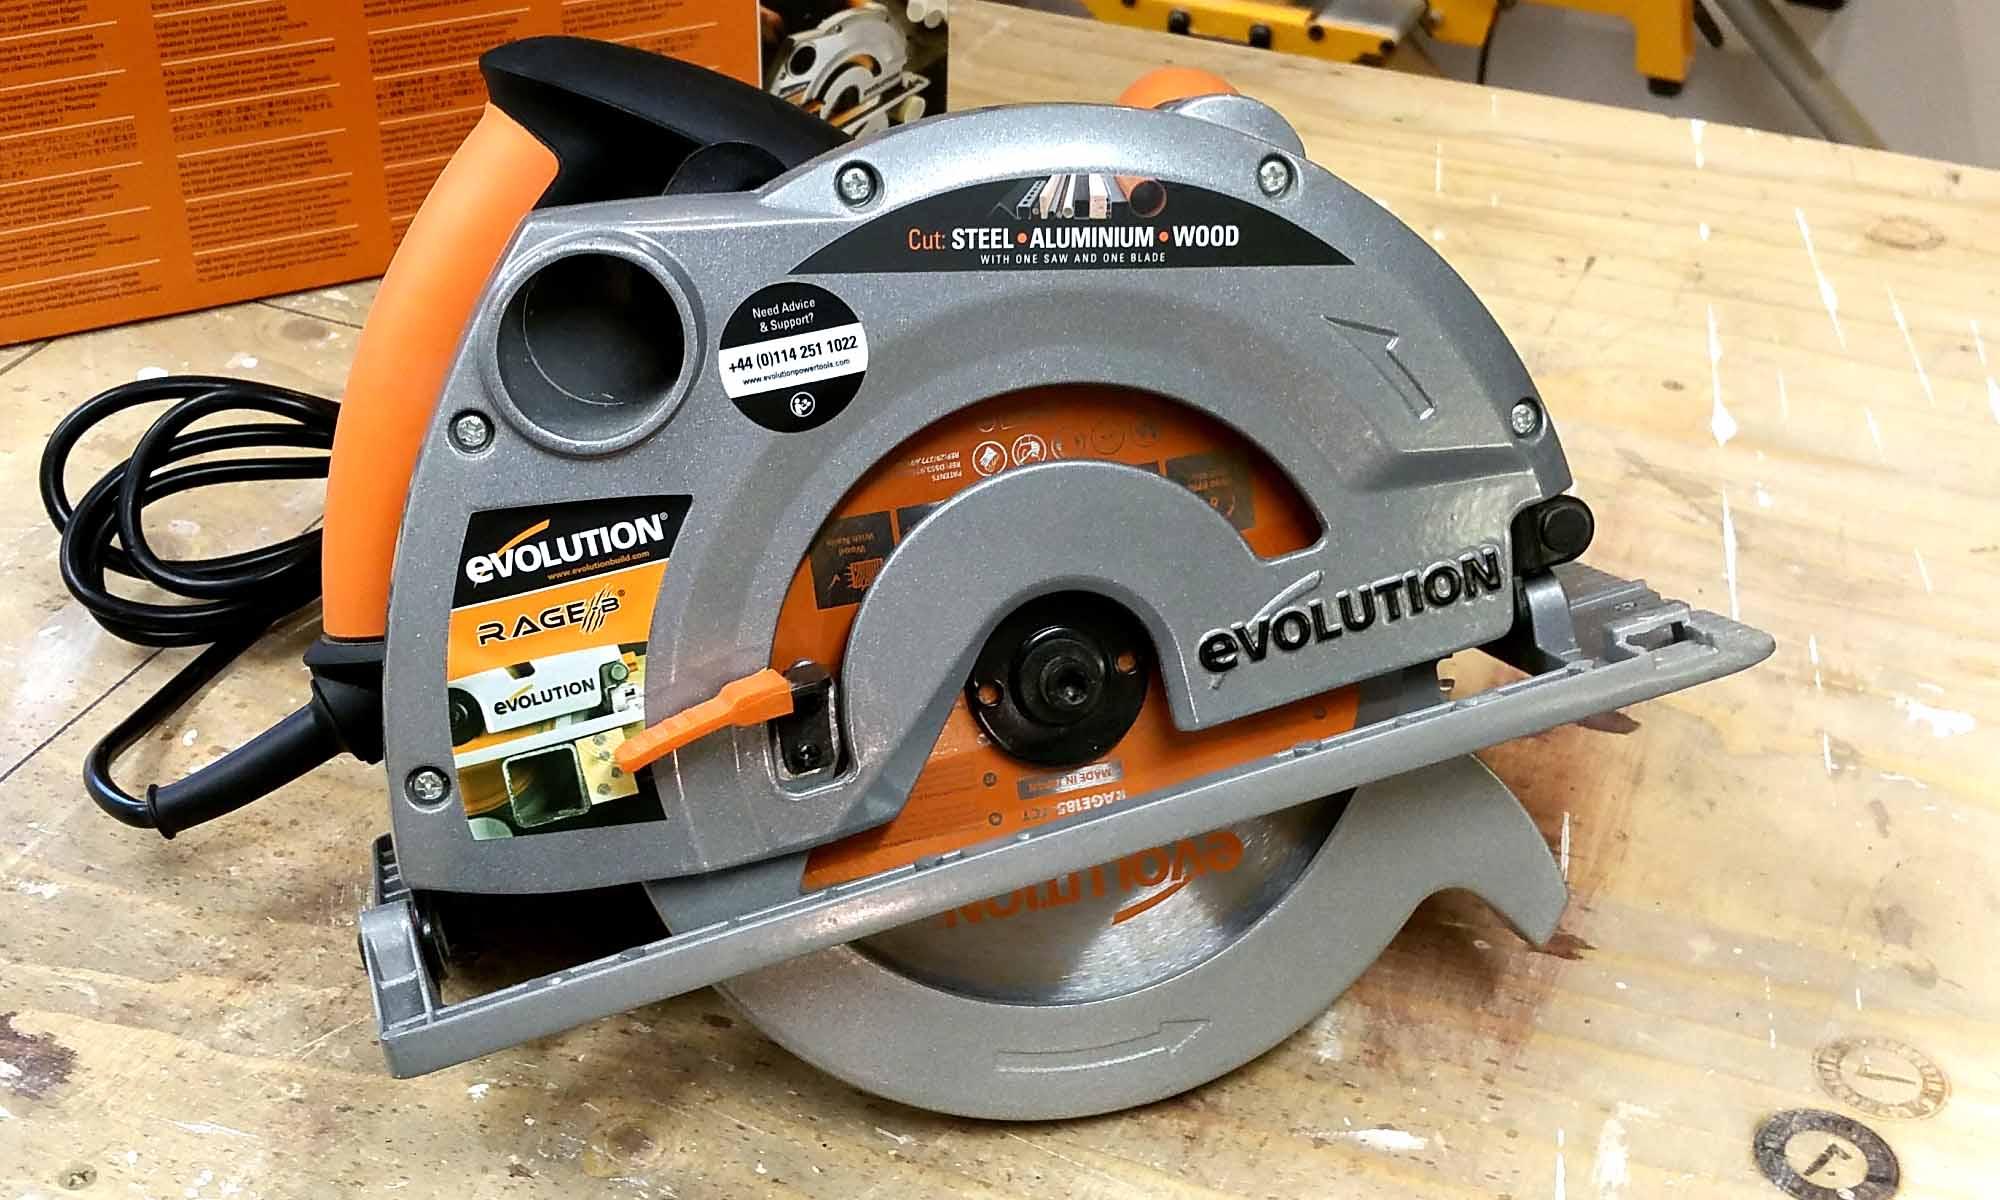 Evolution Circular Saw Review